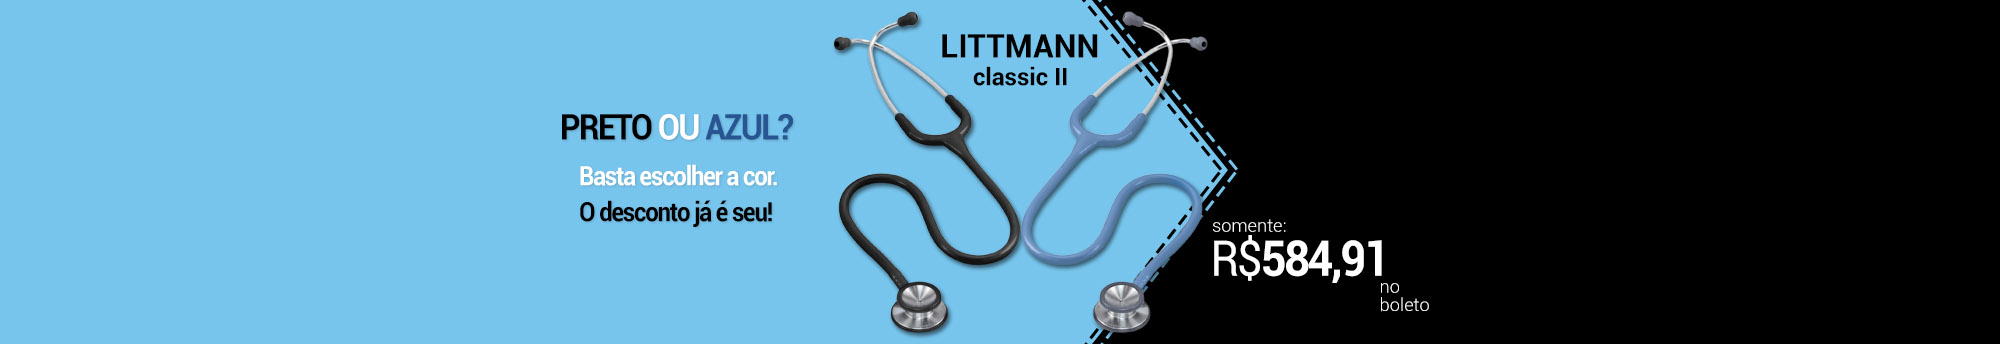 Banner Home - Littmann Preto e Azul